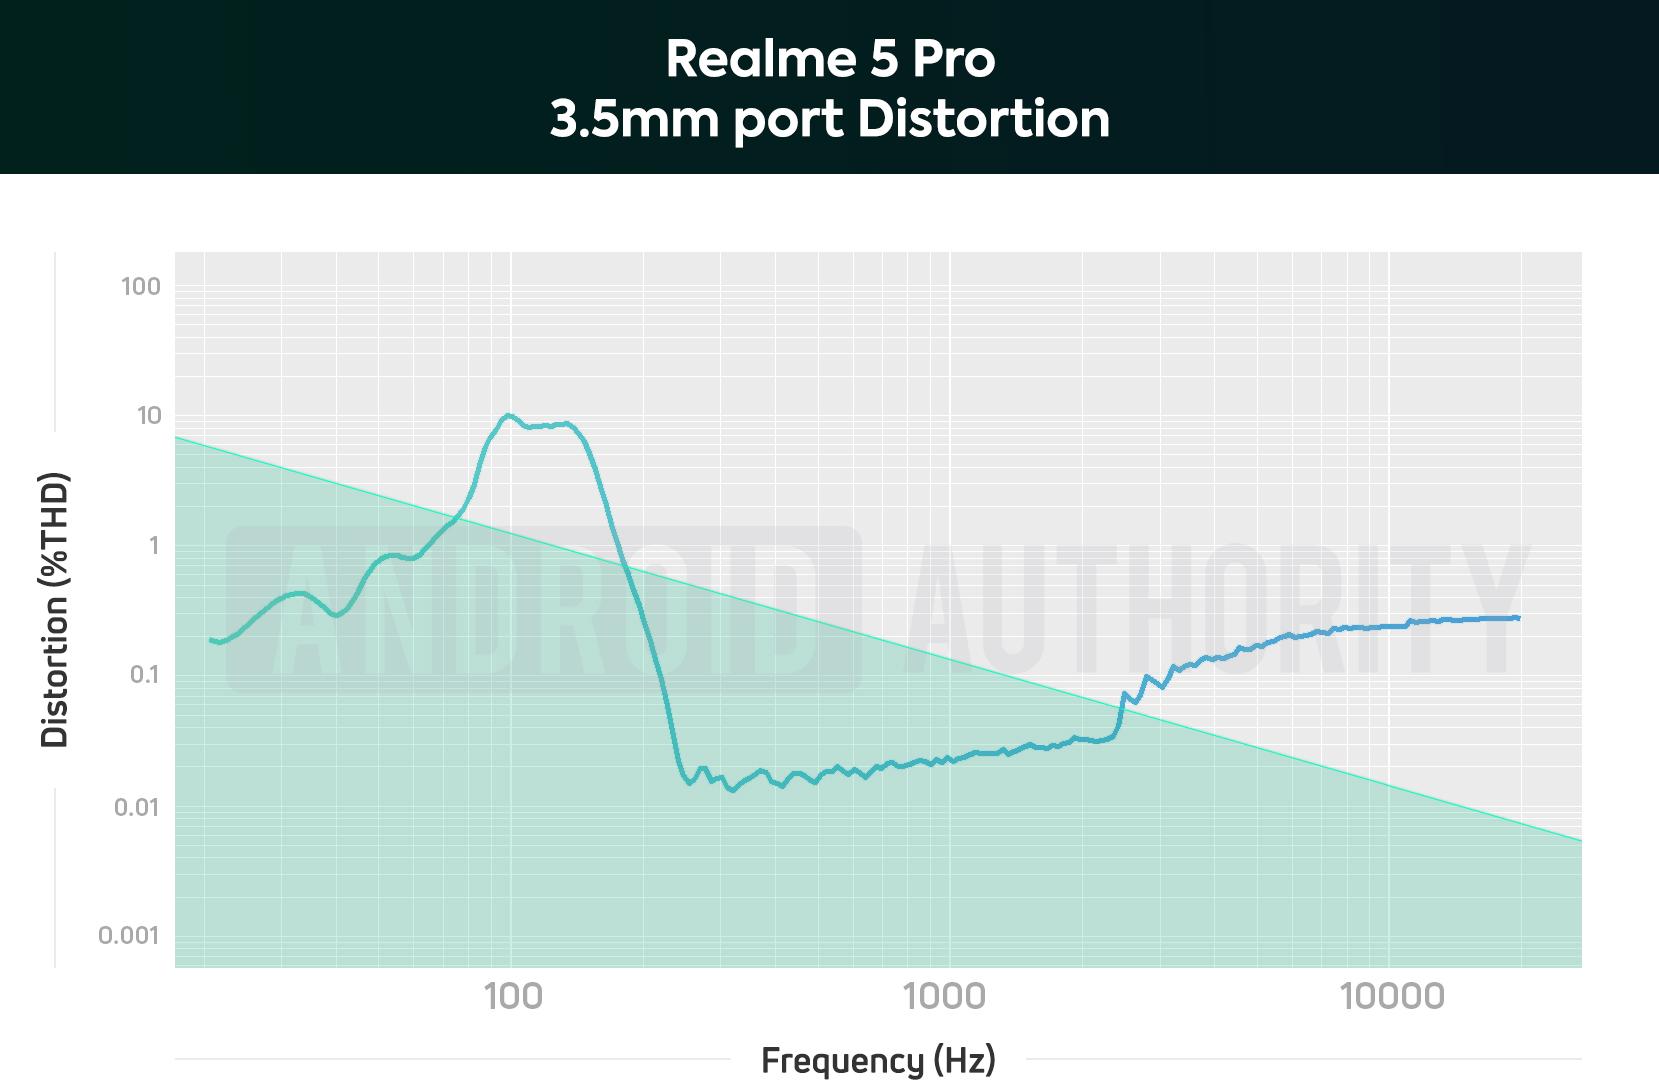 Realme 5 Pro 3.5mm THD Chart